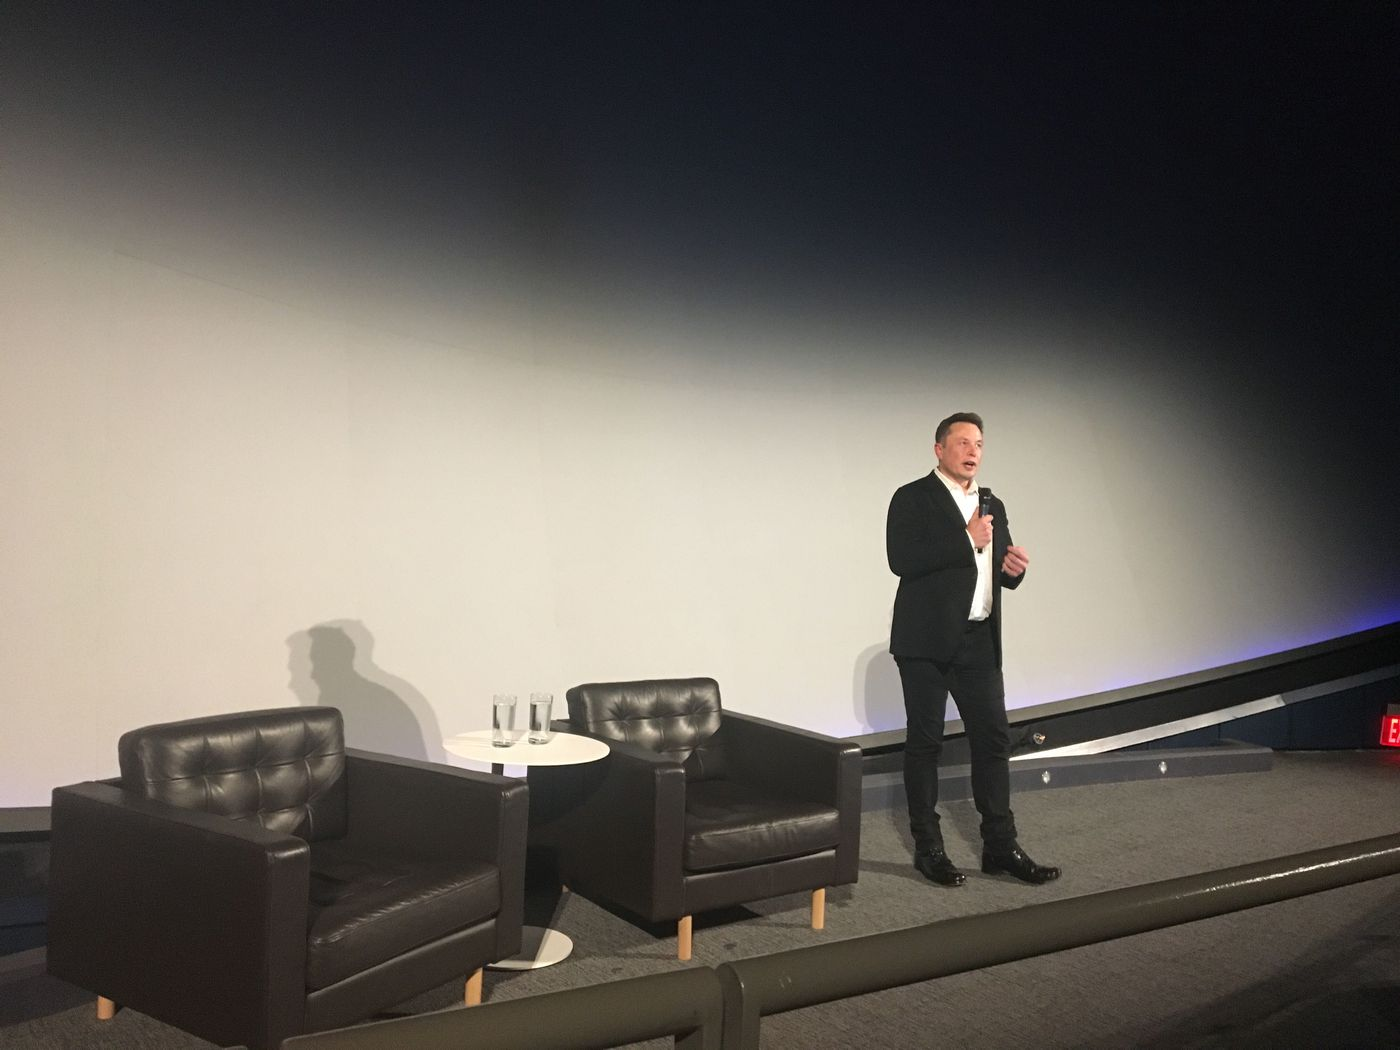 Elon Musk unveils Neuralink's plans for brain-reading 'threads' - The Verge